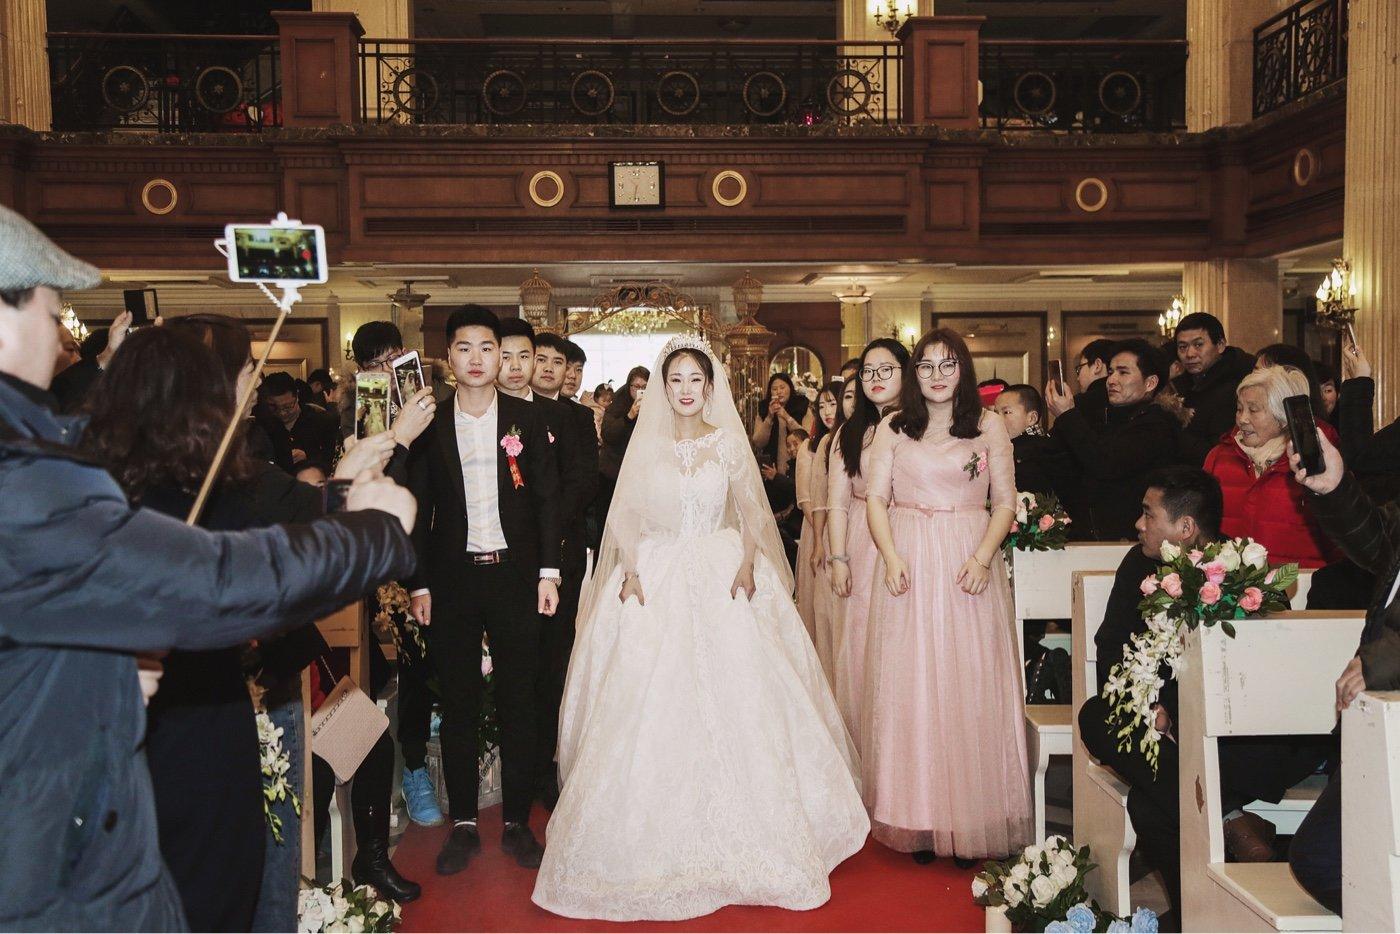 「Fantasy Wedding」&明珠教堂⛪13